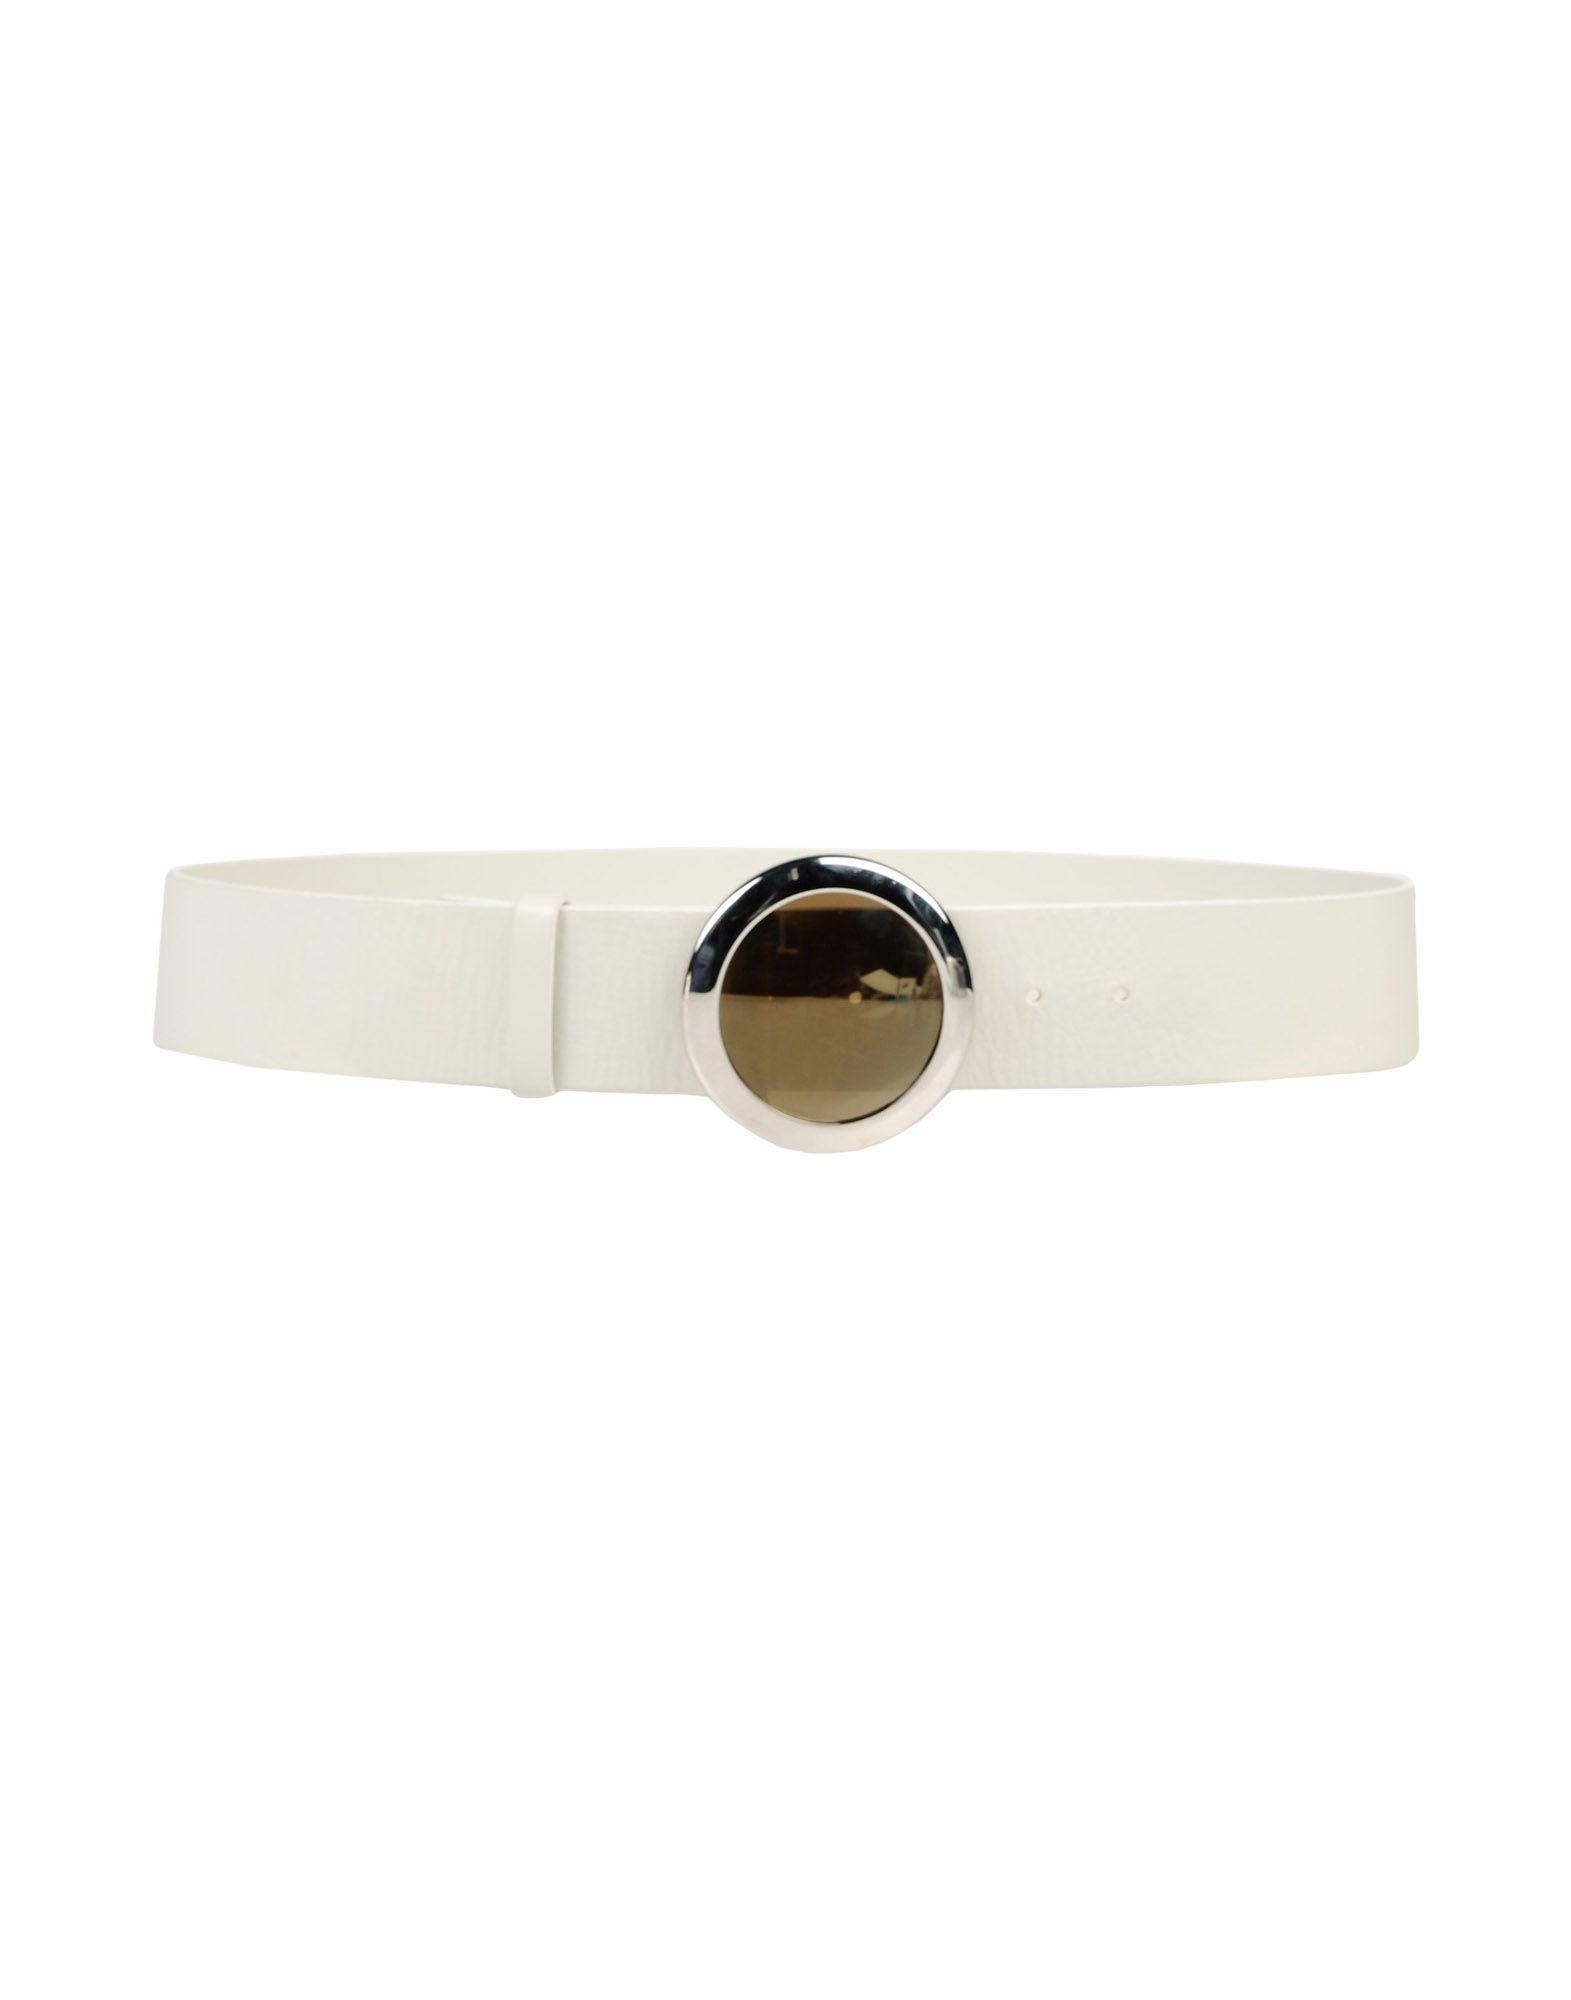 Automatic Adjustable Belt Demure Modern